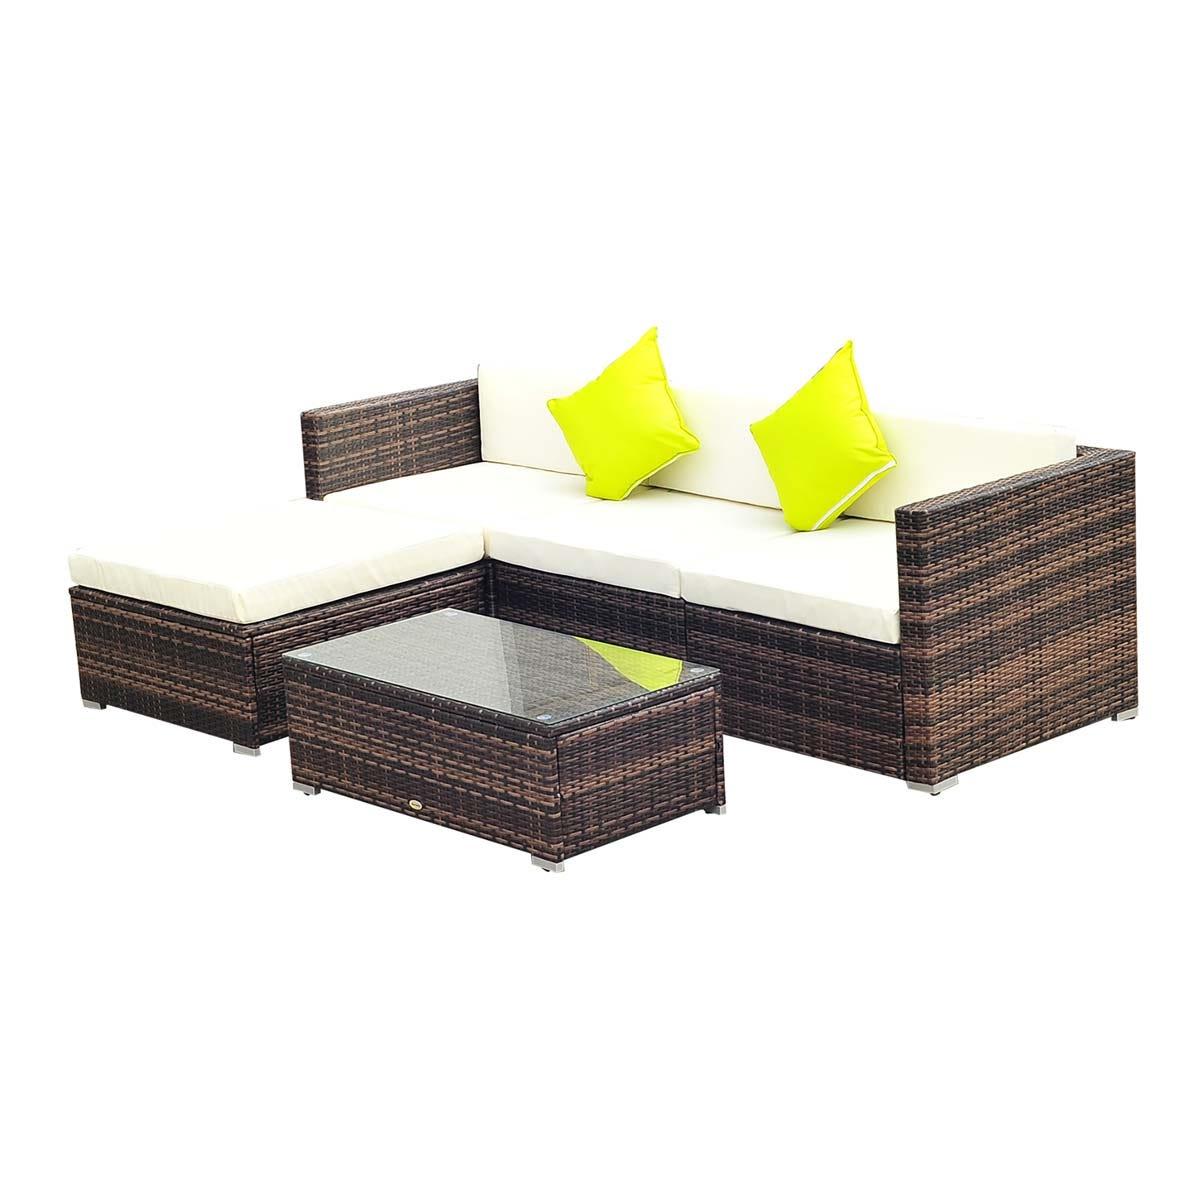 Outsunny 5 Piece Modular Rattan Sofa Set - Brown